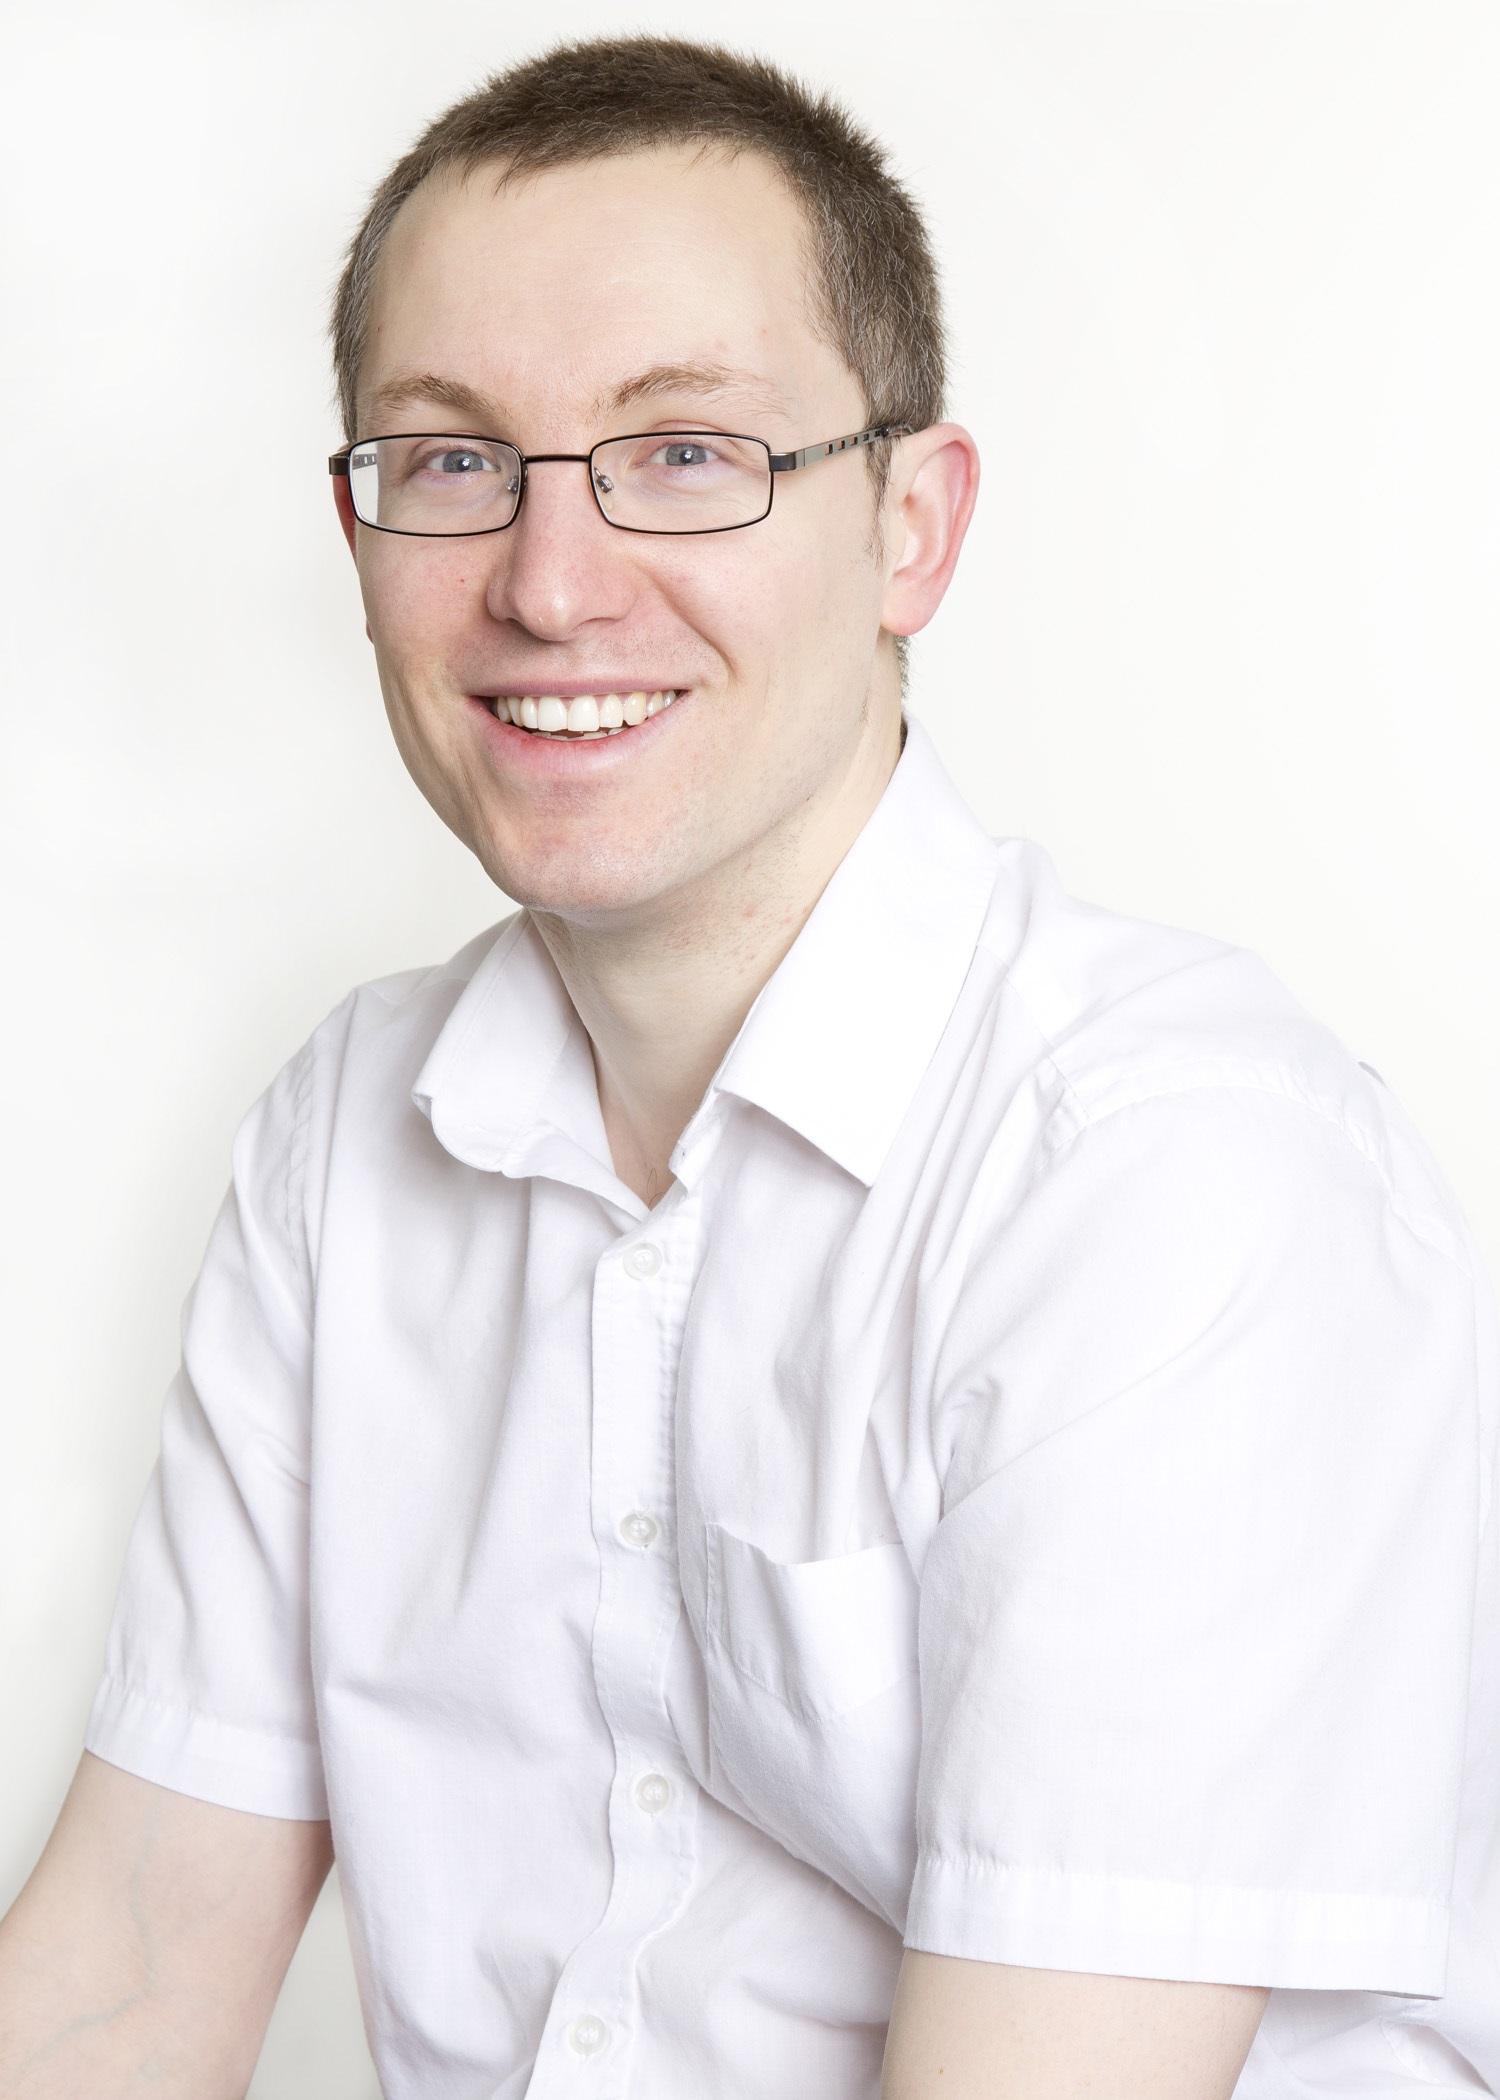 Professor James Chalmers